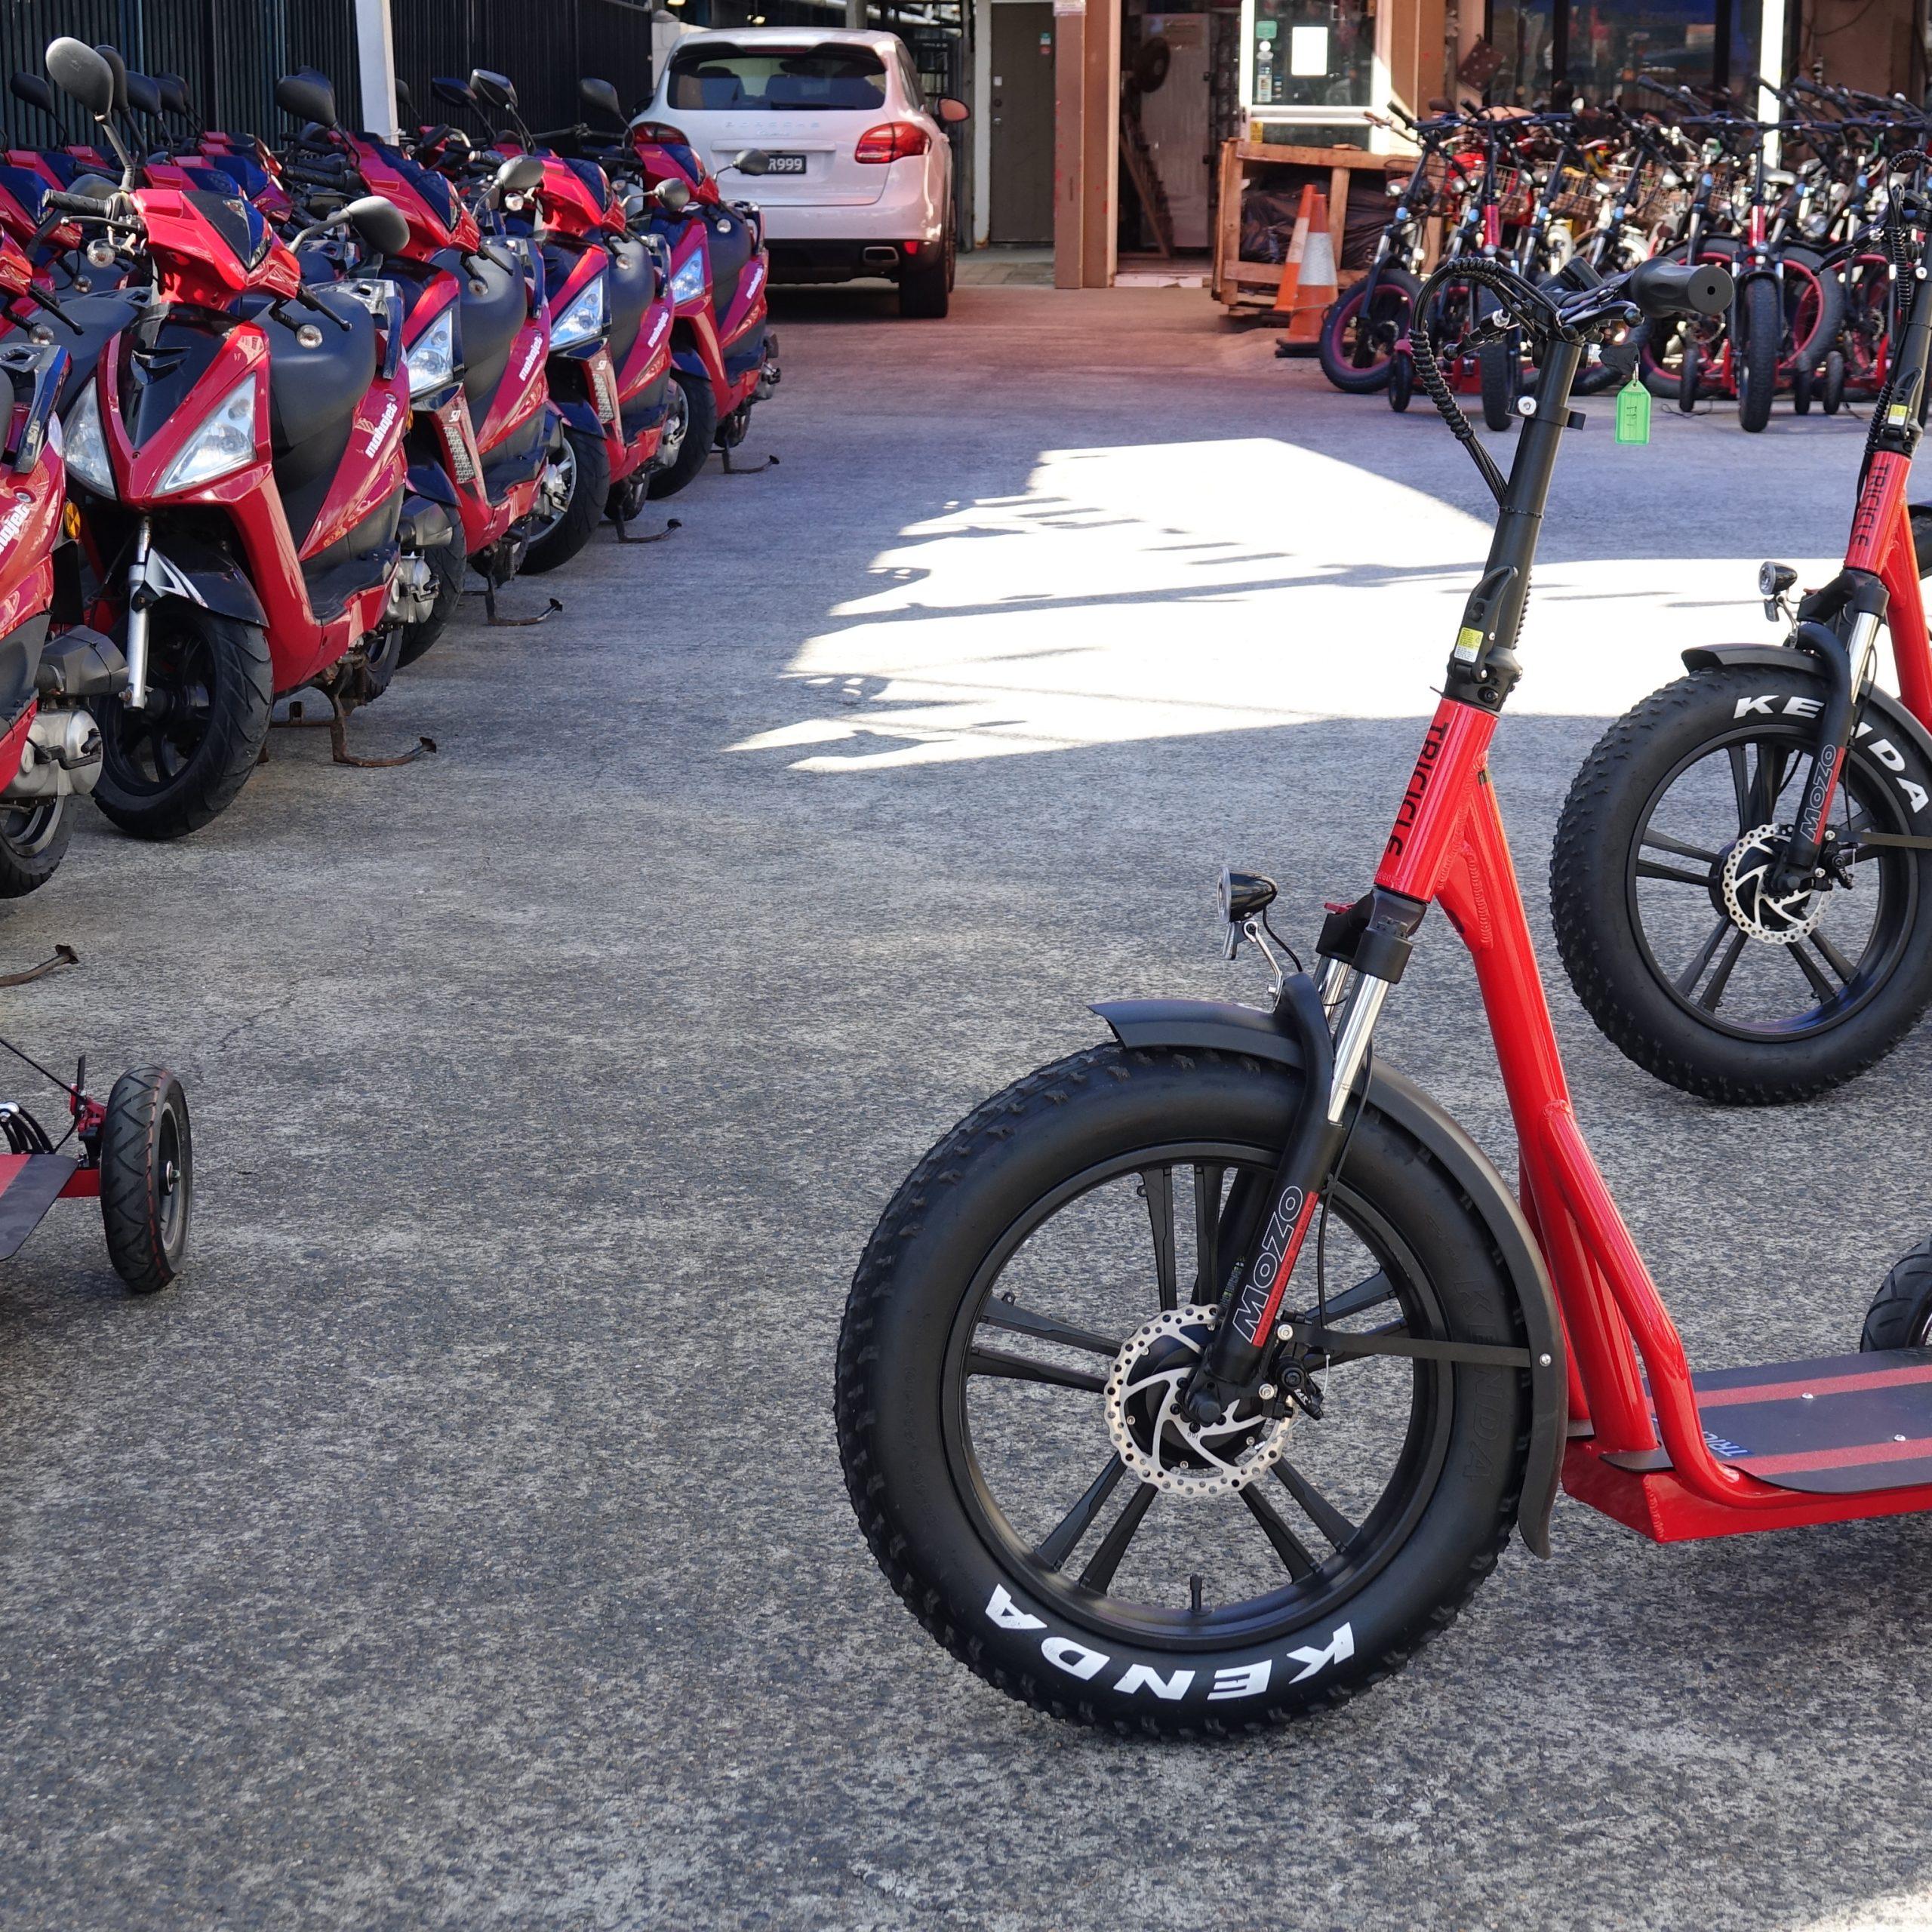 50cc Petrol Scooter Hire Gold Coast